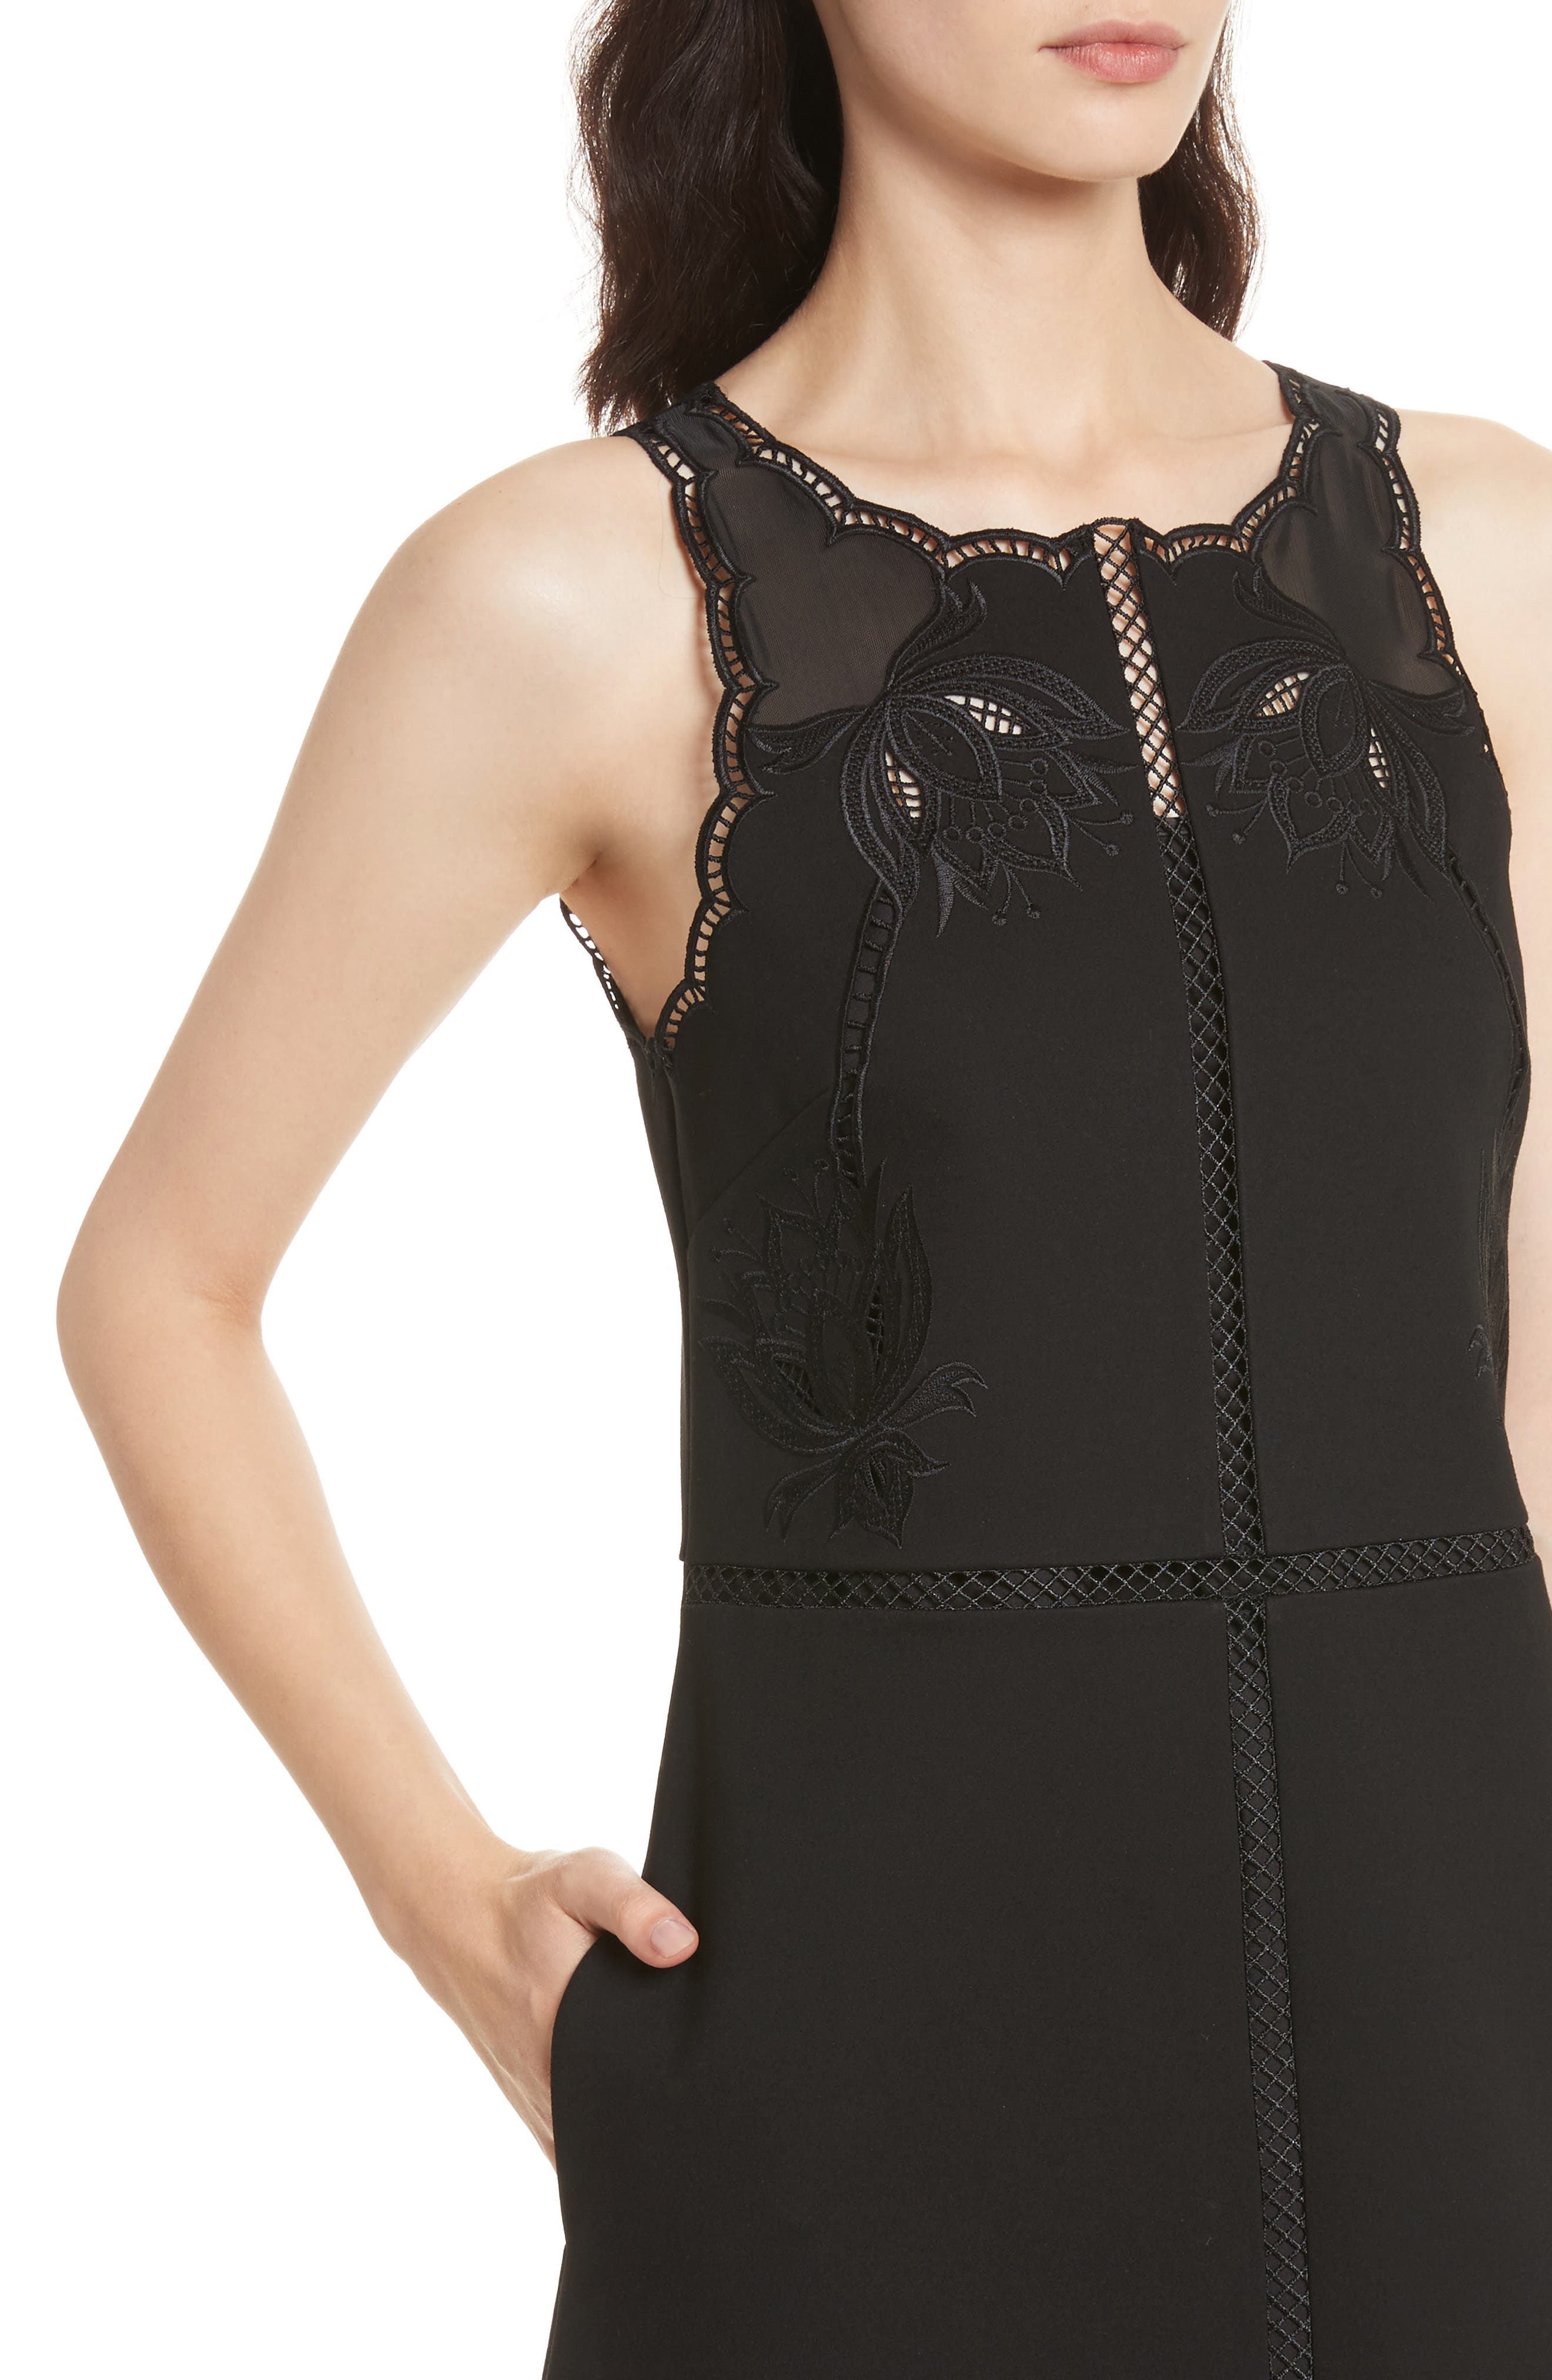 Codi Embroidered Scallop A-Line Dress,                             Alternate thumbnail 4, color,                             001